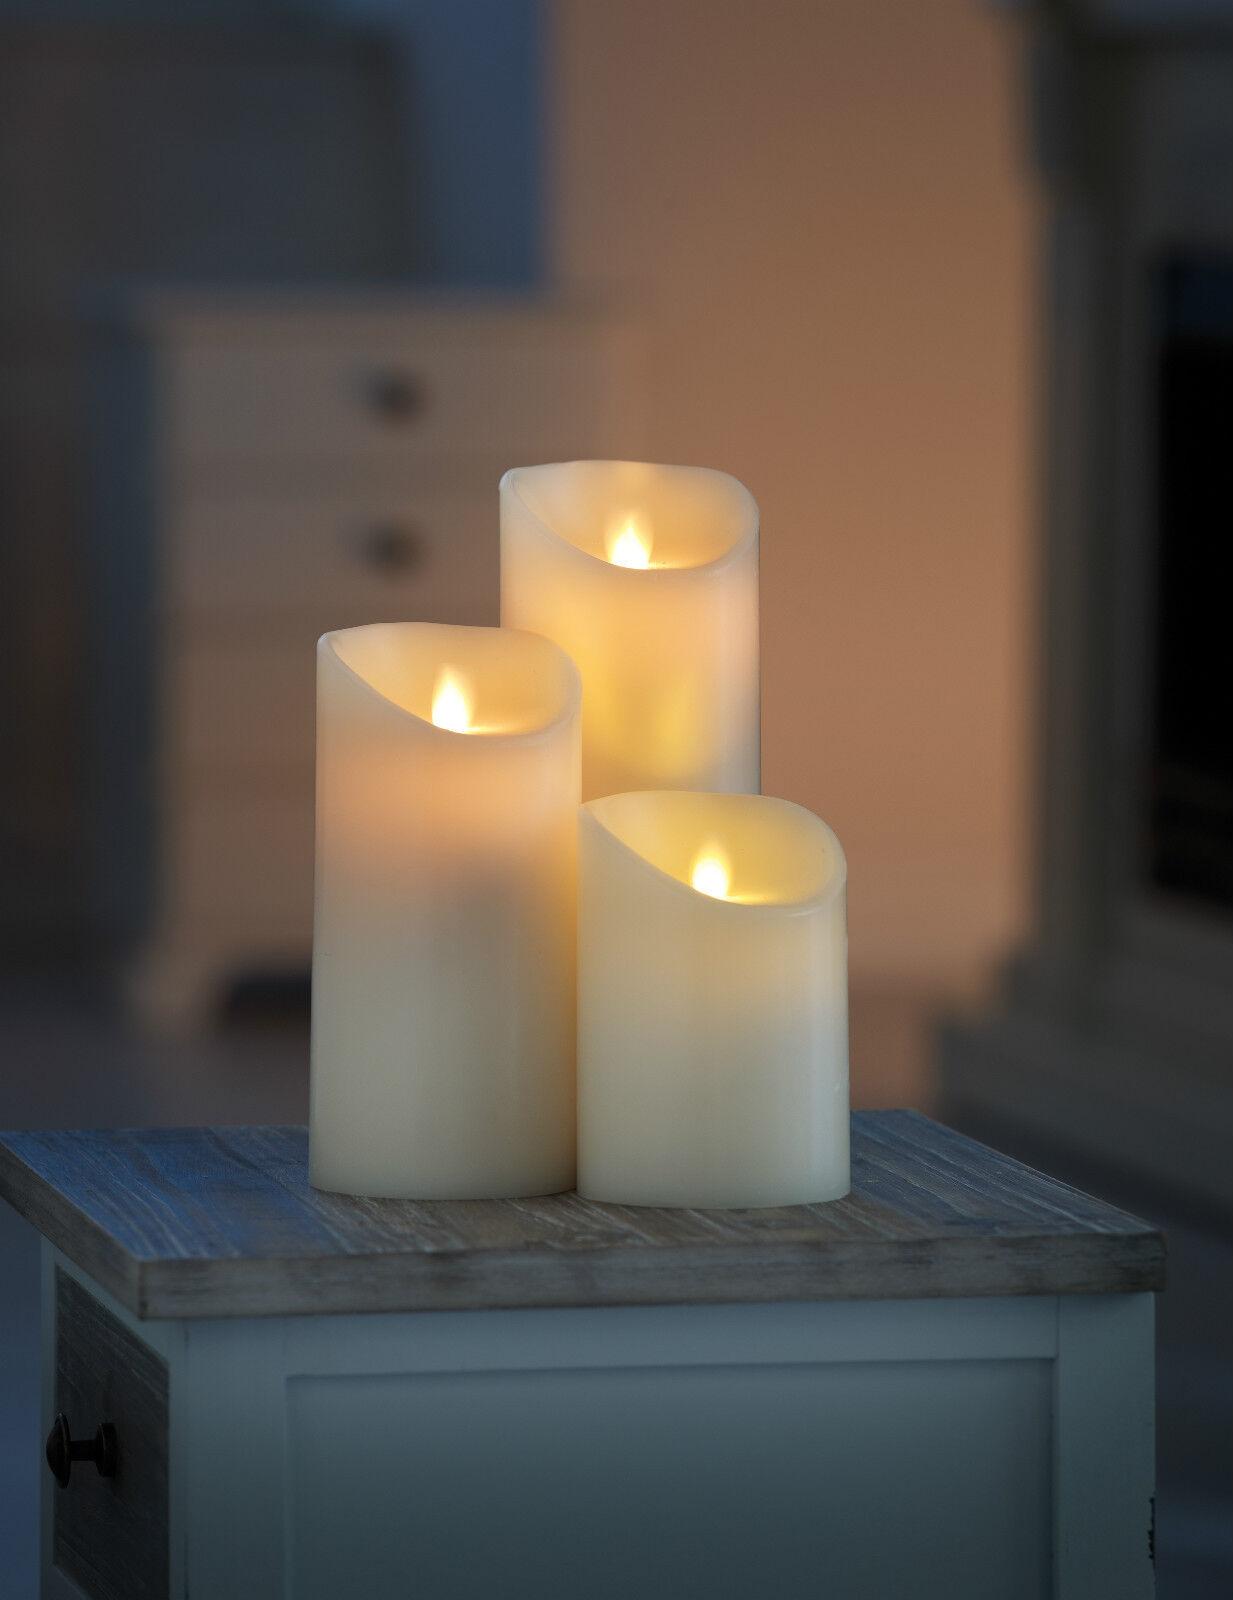 flammenlose led kerze mit beweglicher flamme 8 9 cm 5 stunden timer wie echt eur 23 99. Black Bedroom Furniture Sets. Home Design Ideas